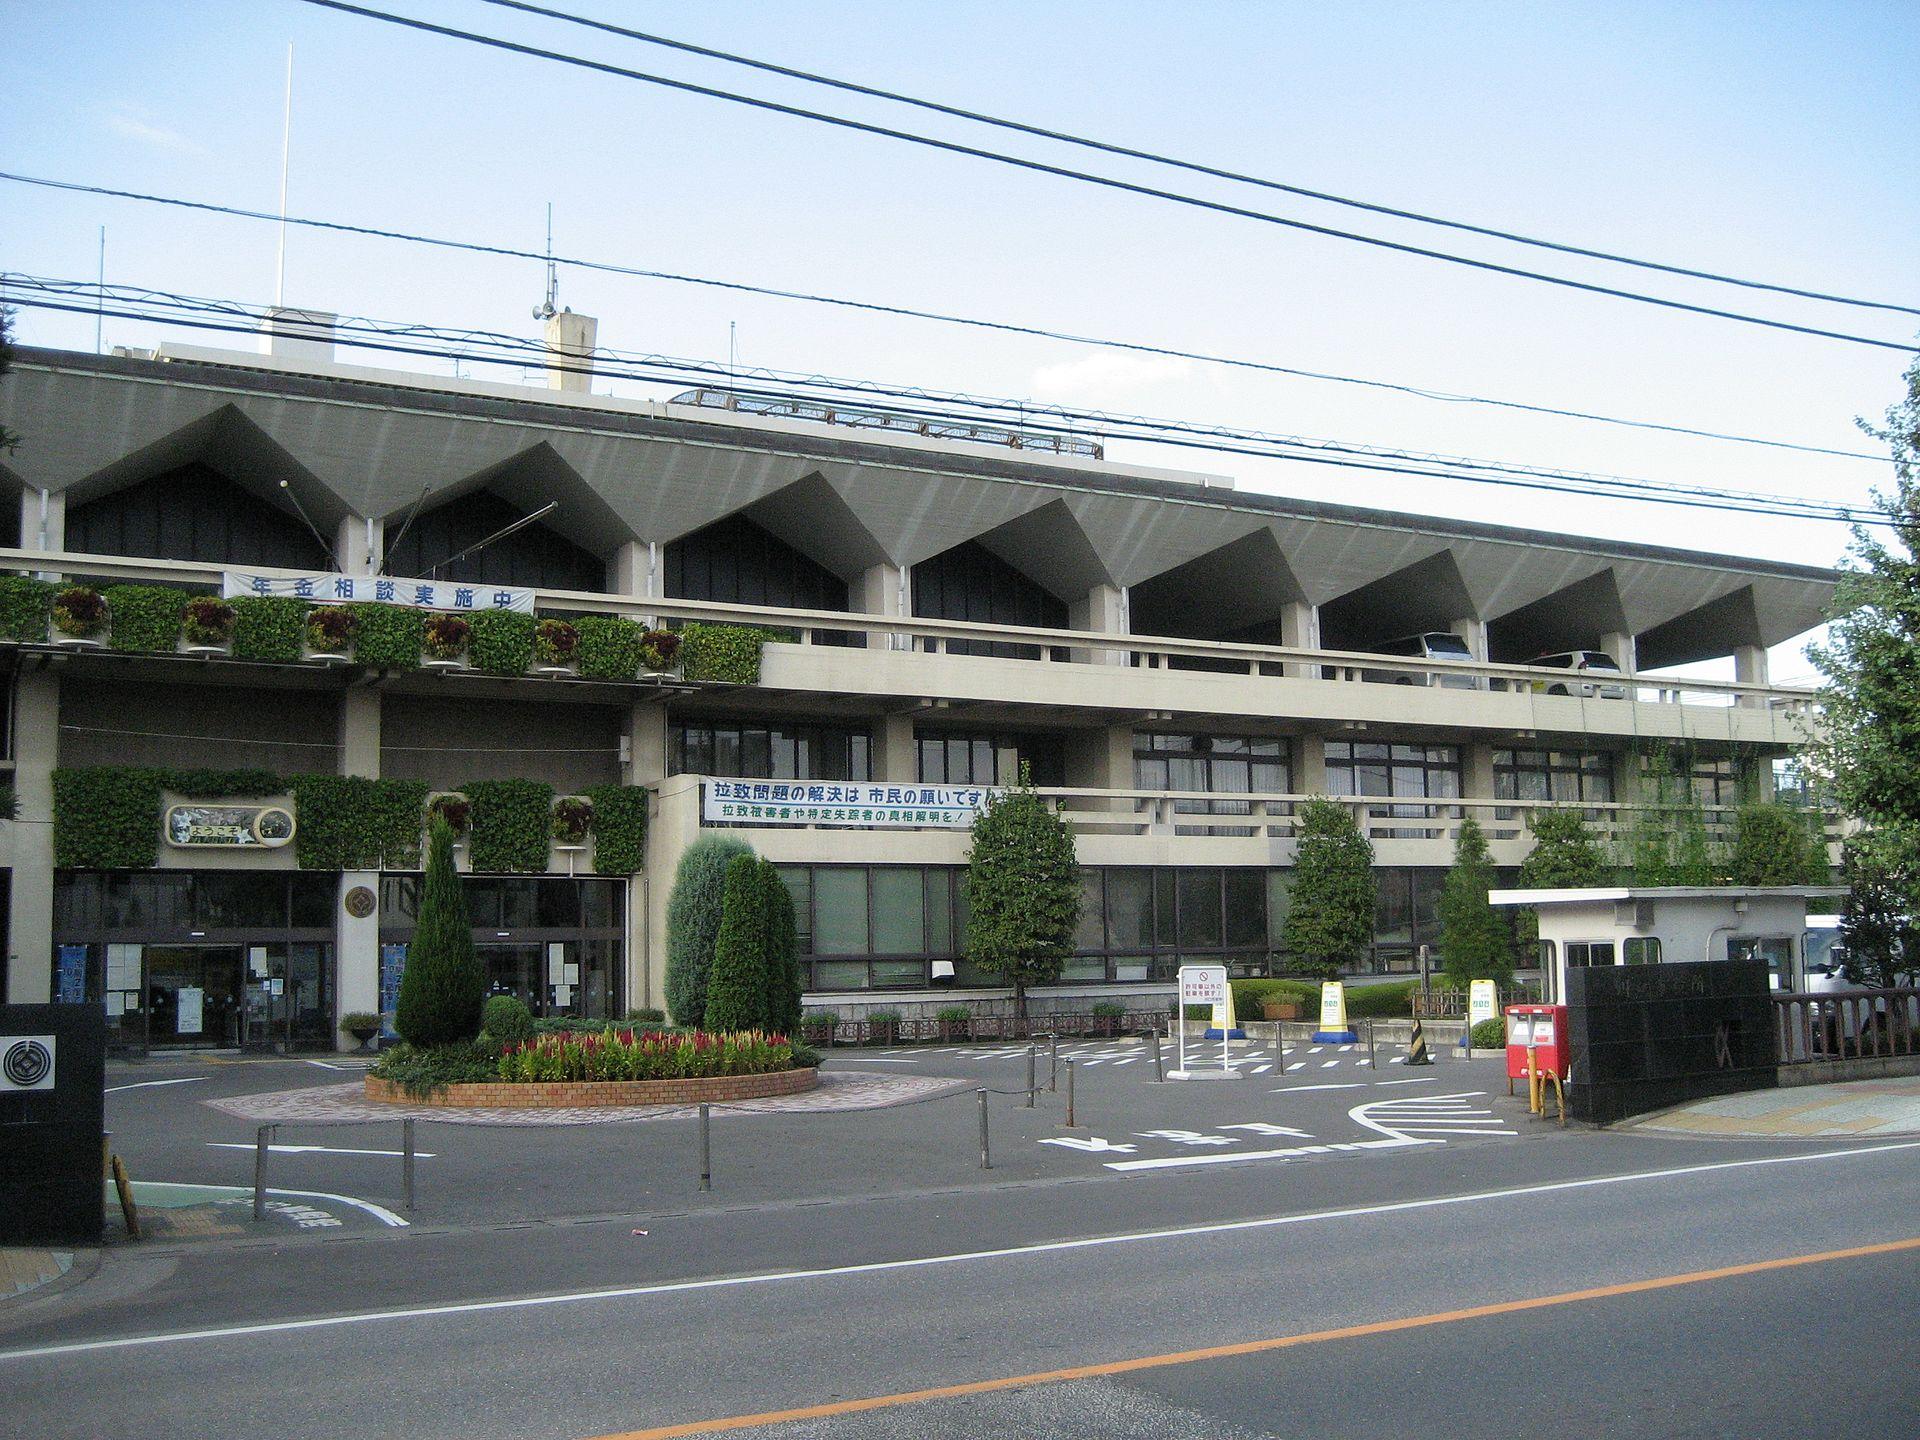 Kawaguchi city office Saitama prefecture Japan2.jpg